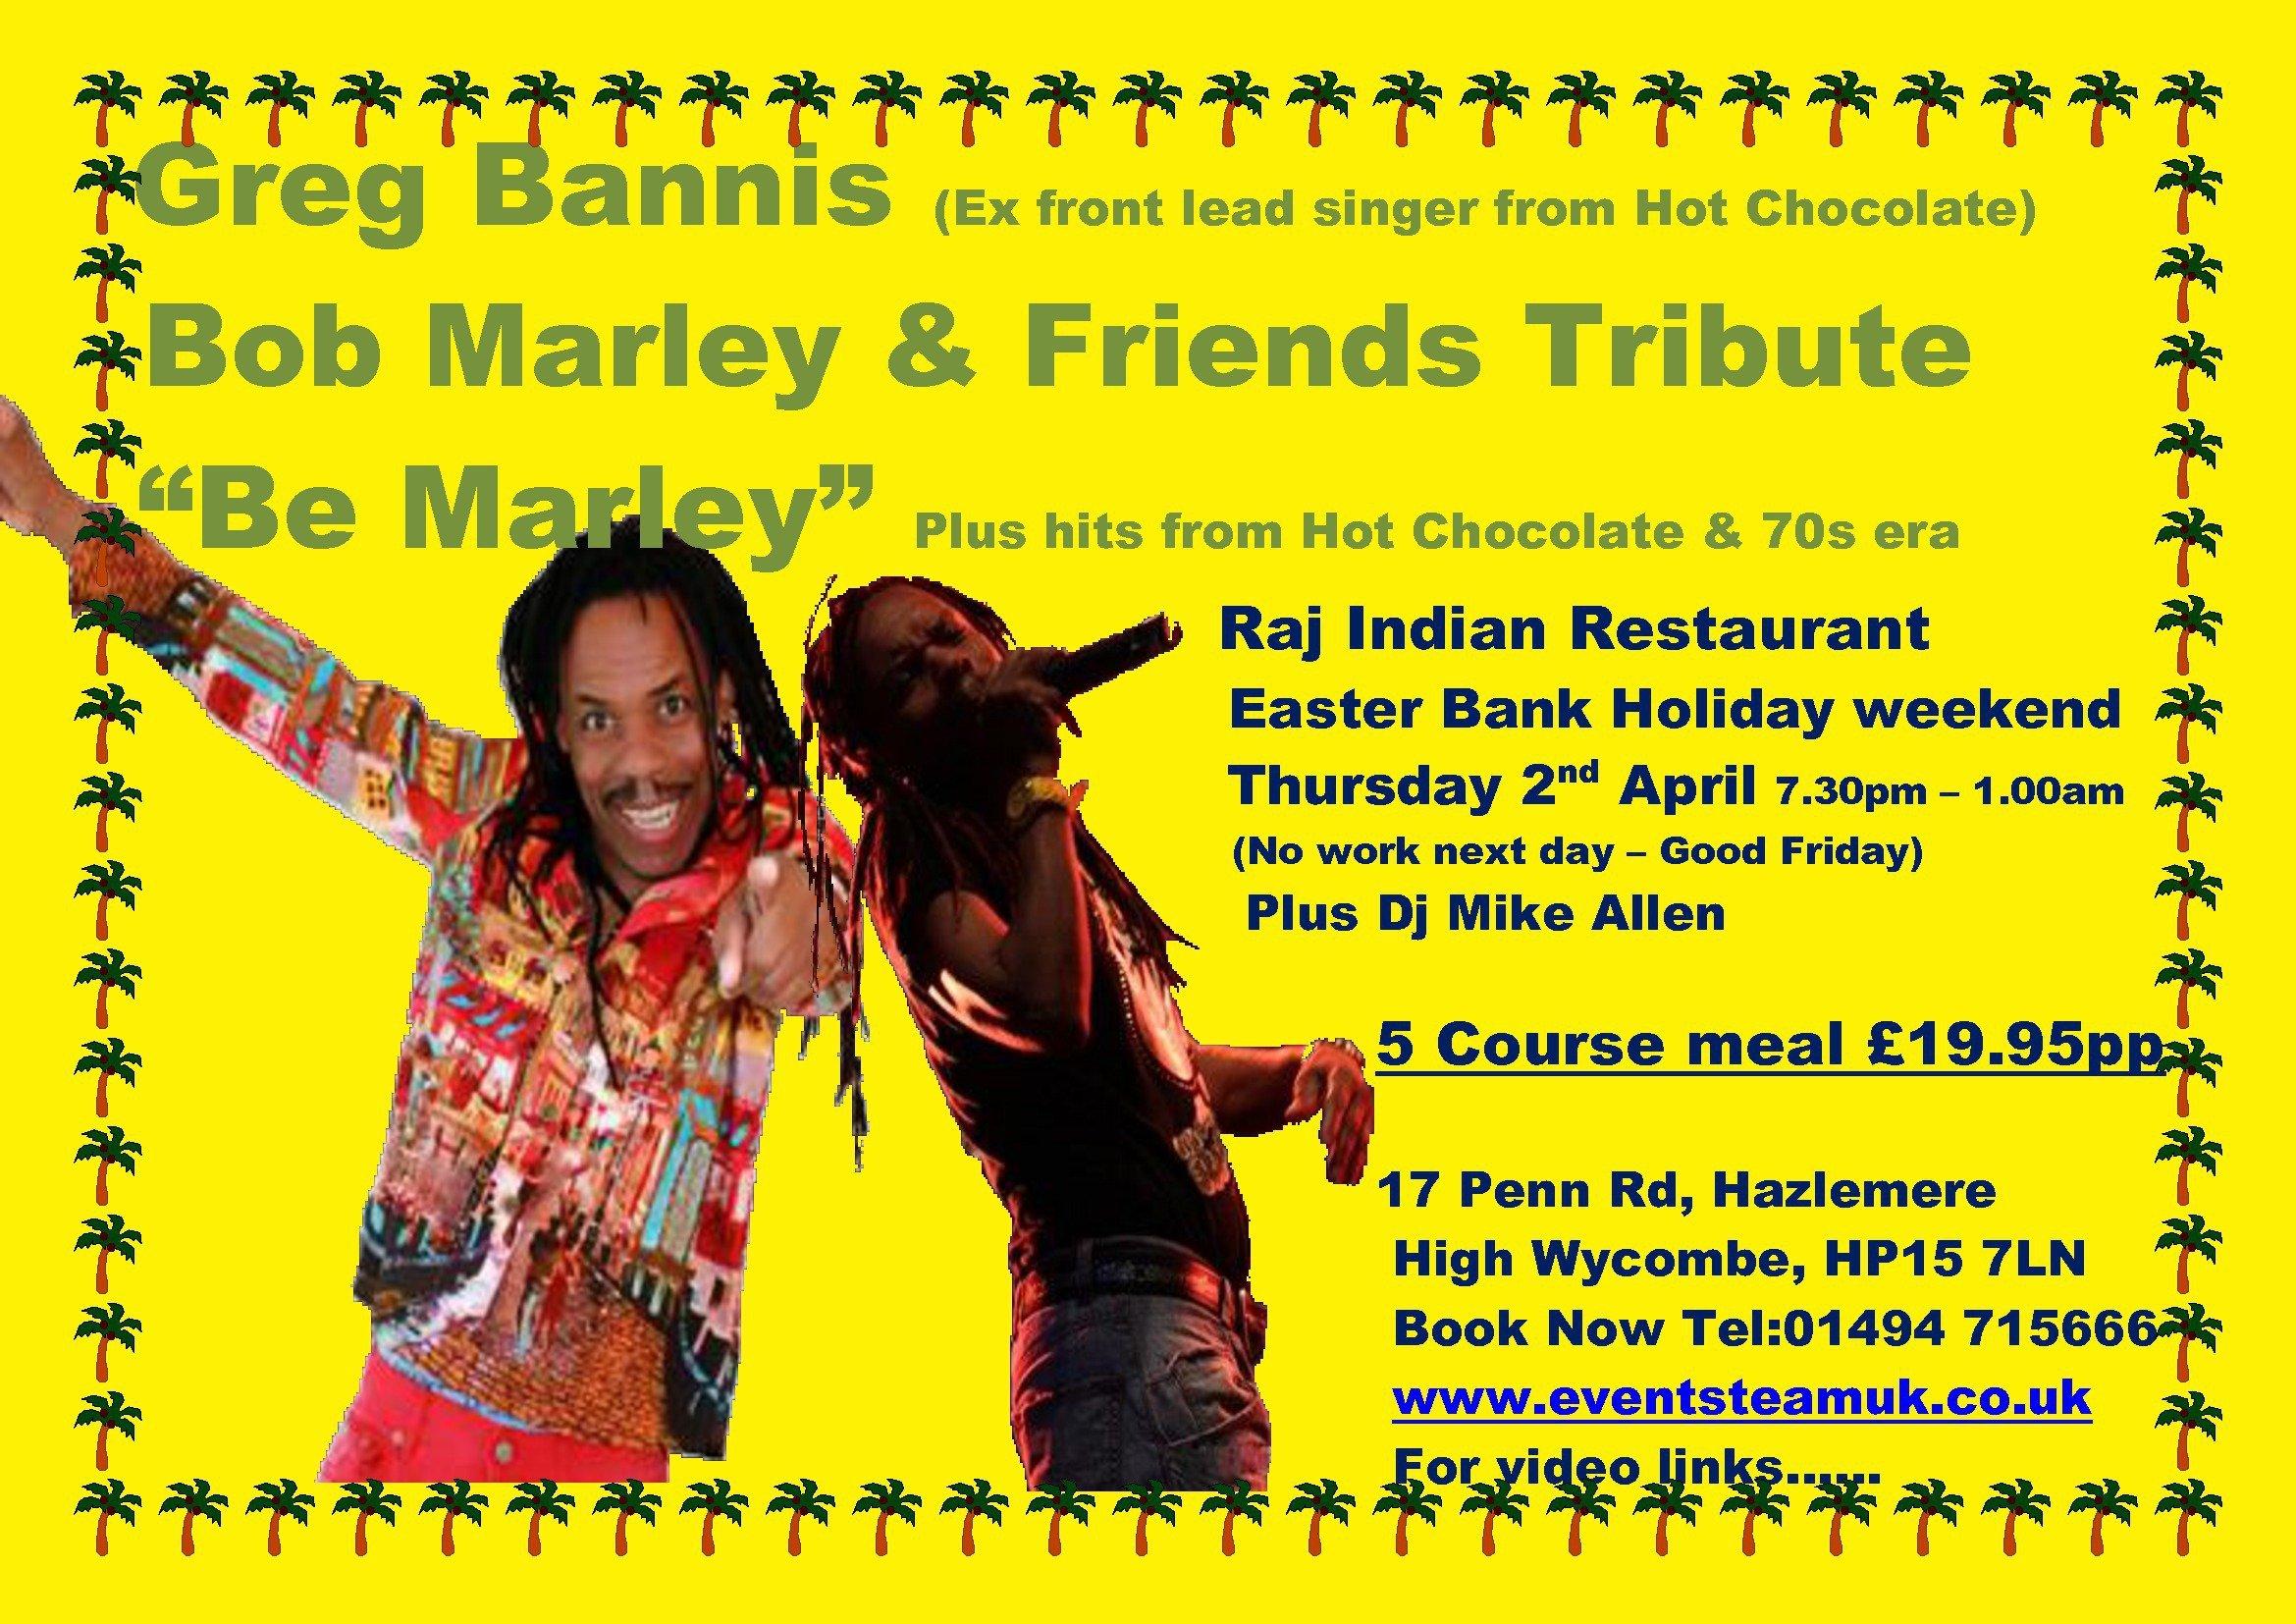 Marley & friends tribute